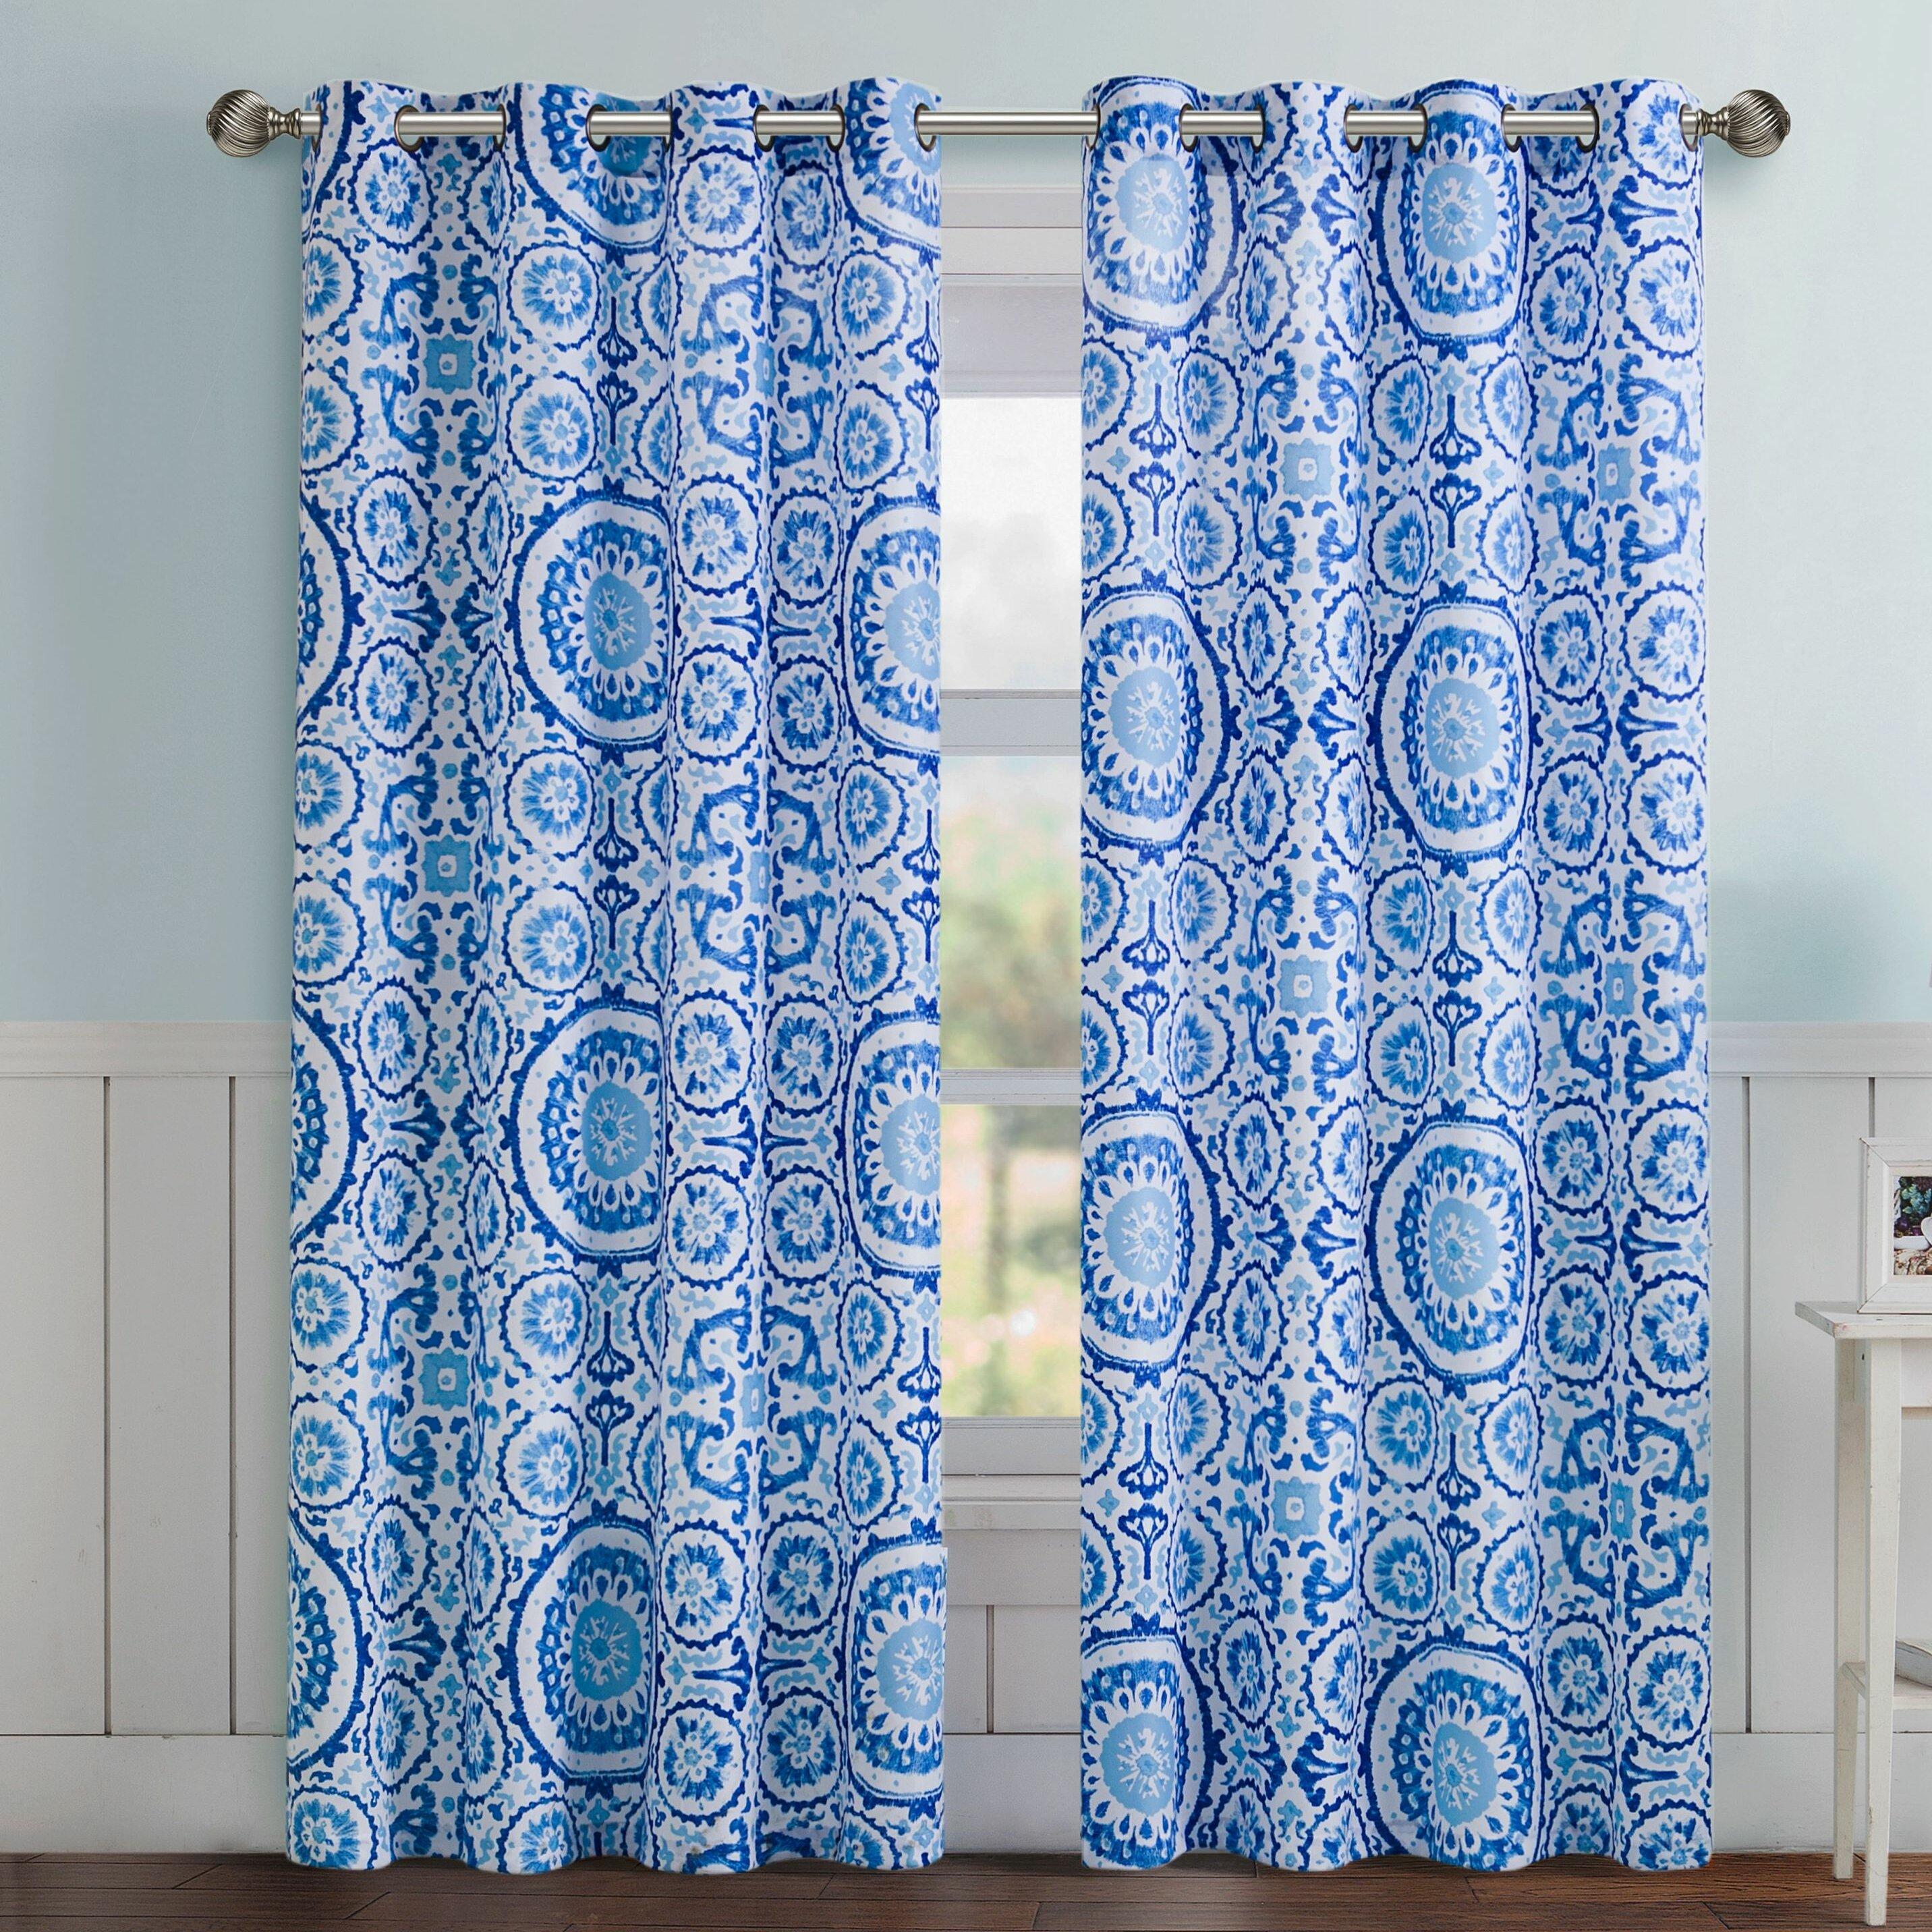 Dakota Fields Koga Geometric Room Darkening Grommet Curtain Panels Reviews Wayfair